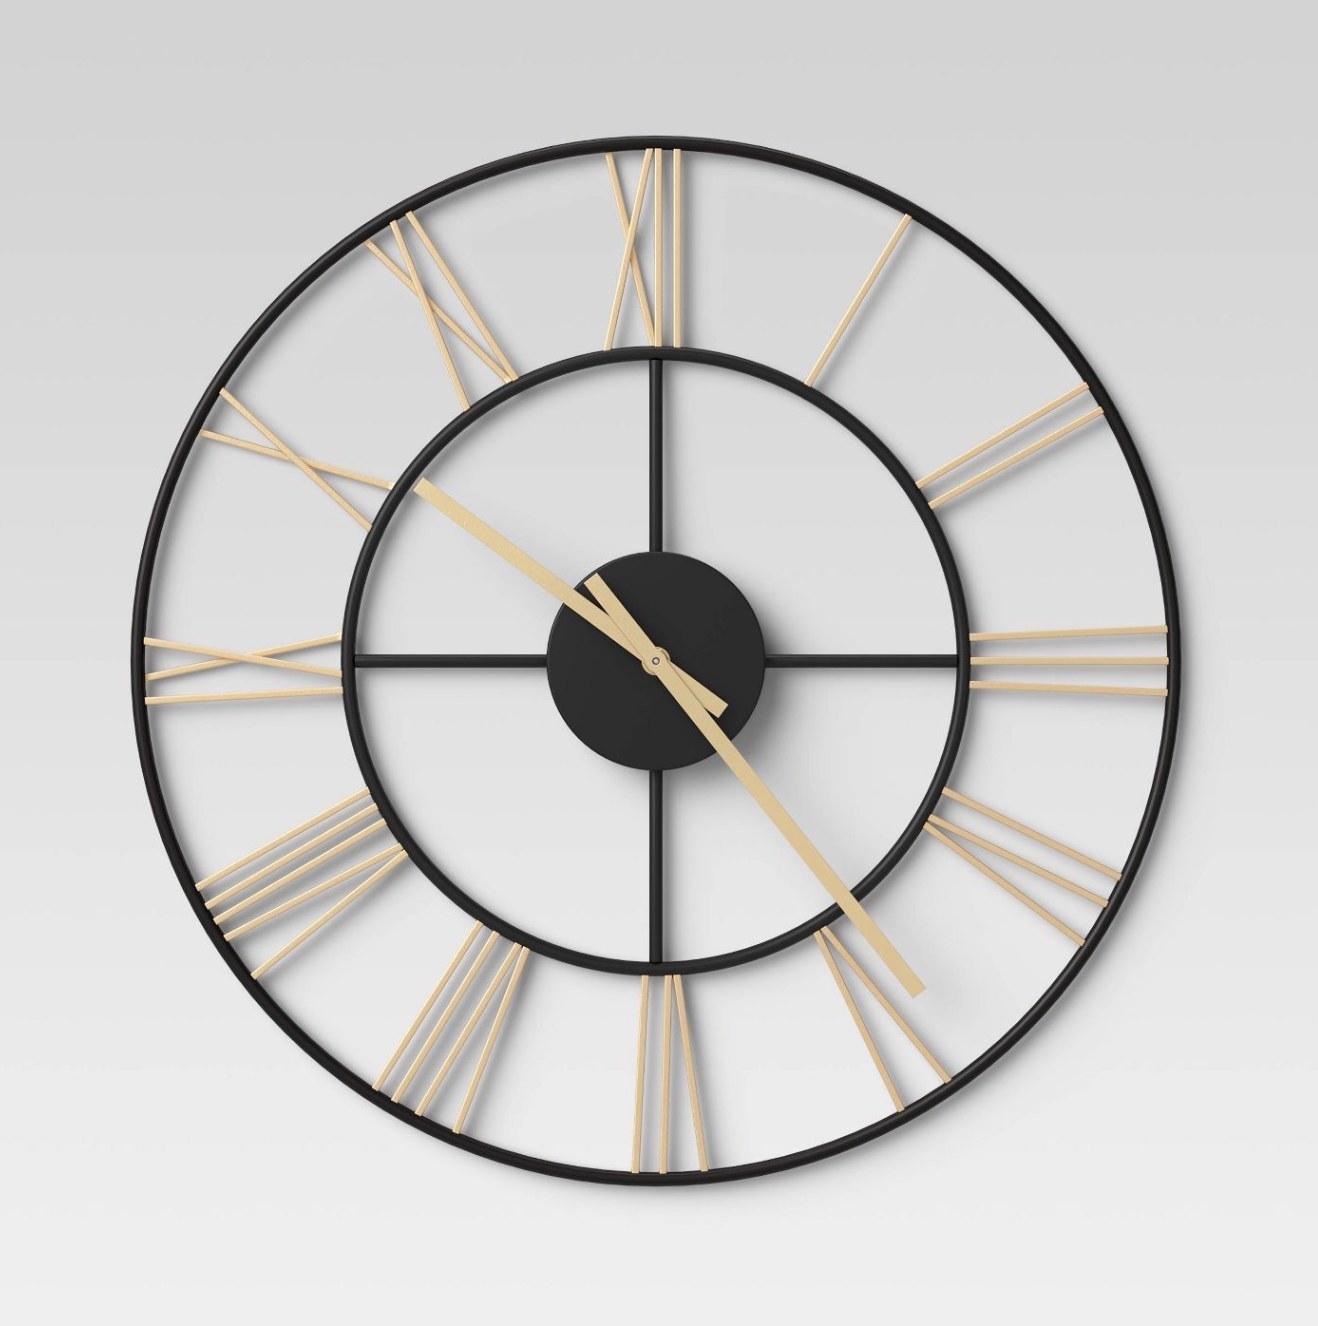 Wall clock mounted on wall.